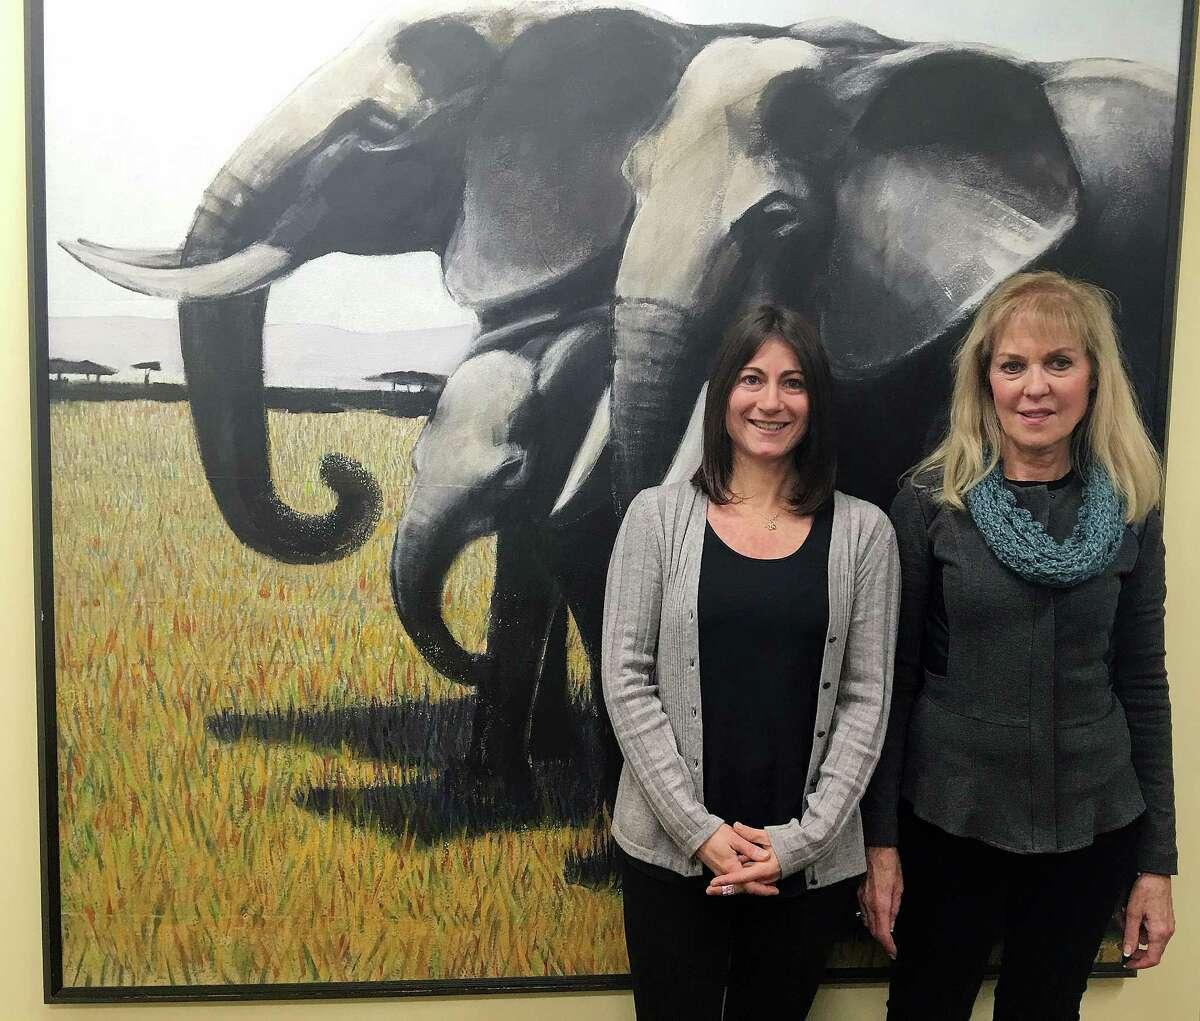 Nicole Rivard (left), correspondent, and Priscilla Feral, president, at Friends of Animals office in Darien, CT on Dec. 19, 2016.